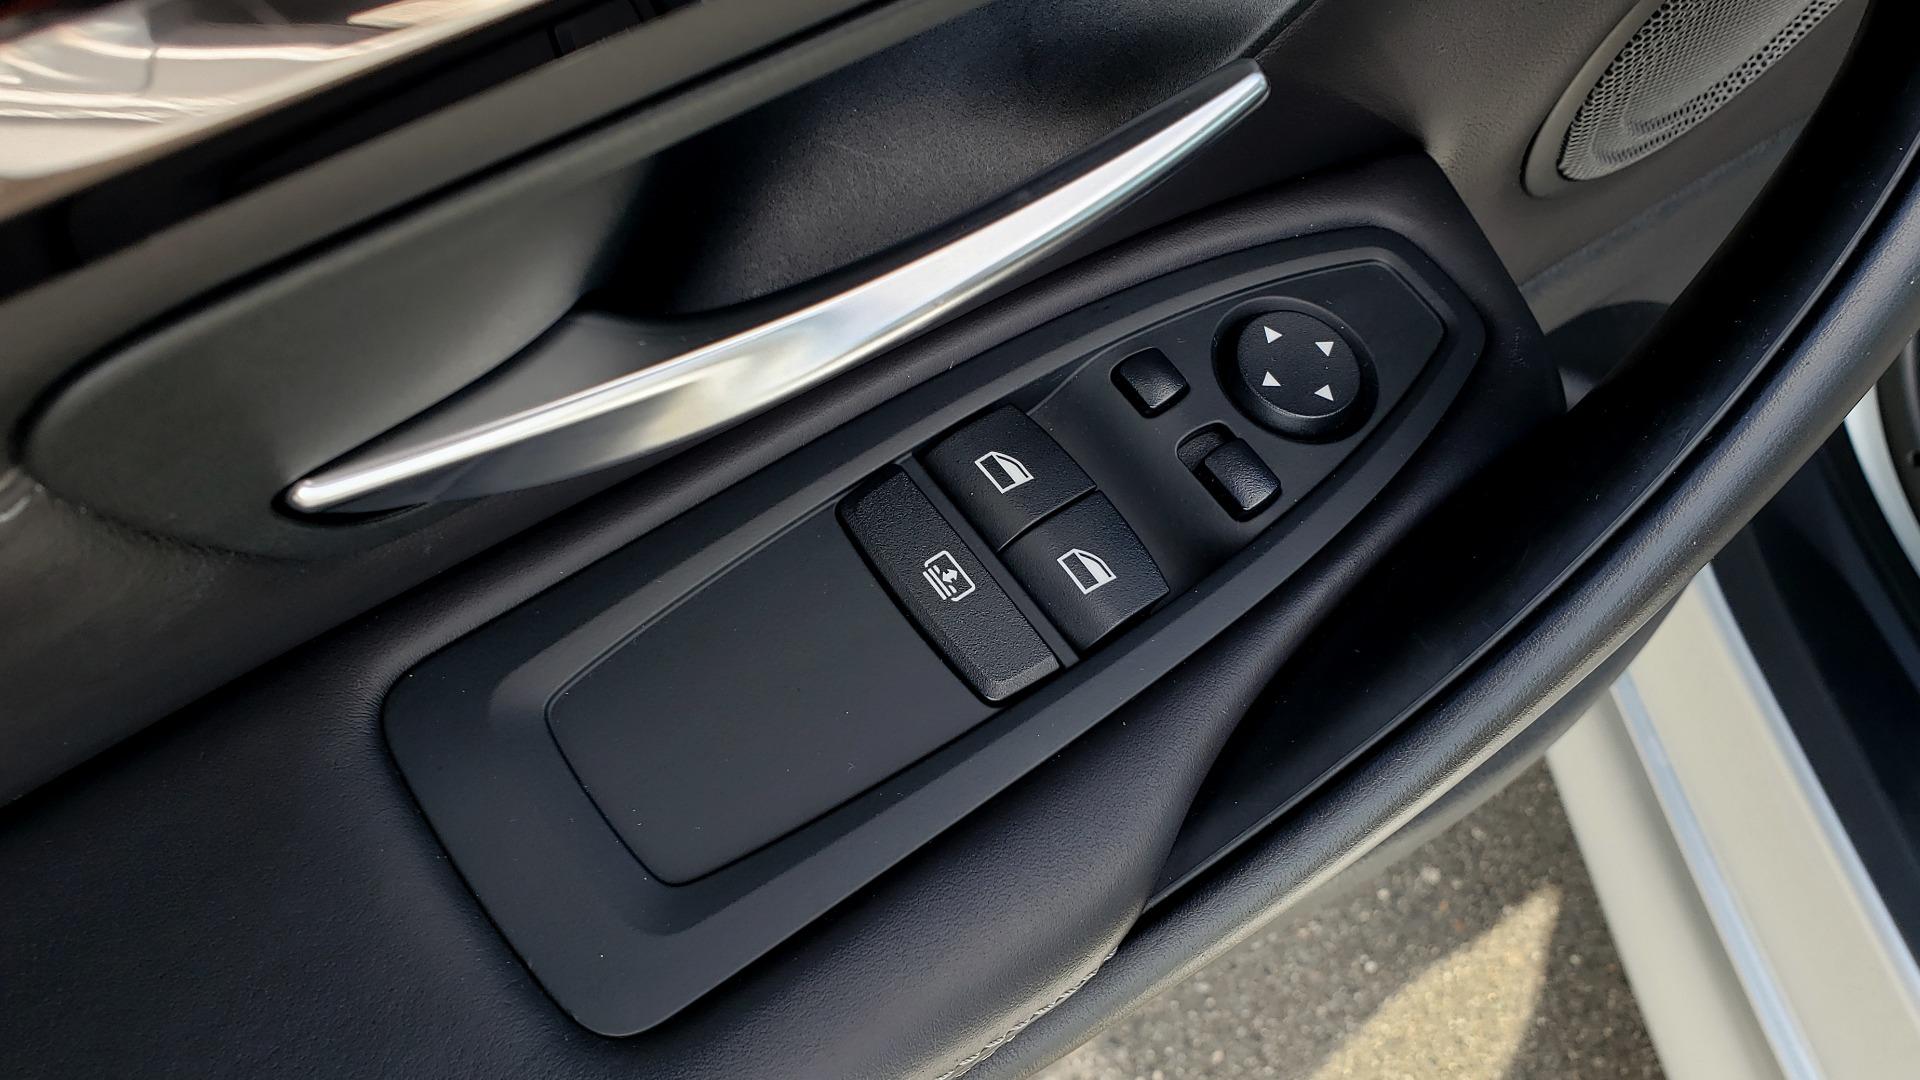 Used 2015 BMW M4 COUPE / EXEC PKG / DRVR ASST PLUS / LIGHTING / M-SUSPENSION for sale Sold at Formula Imports in Charlotte NC 28227 37